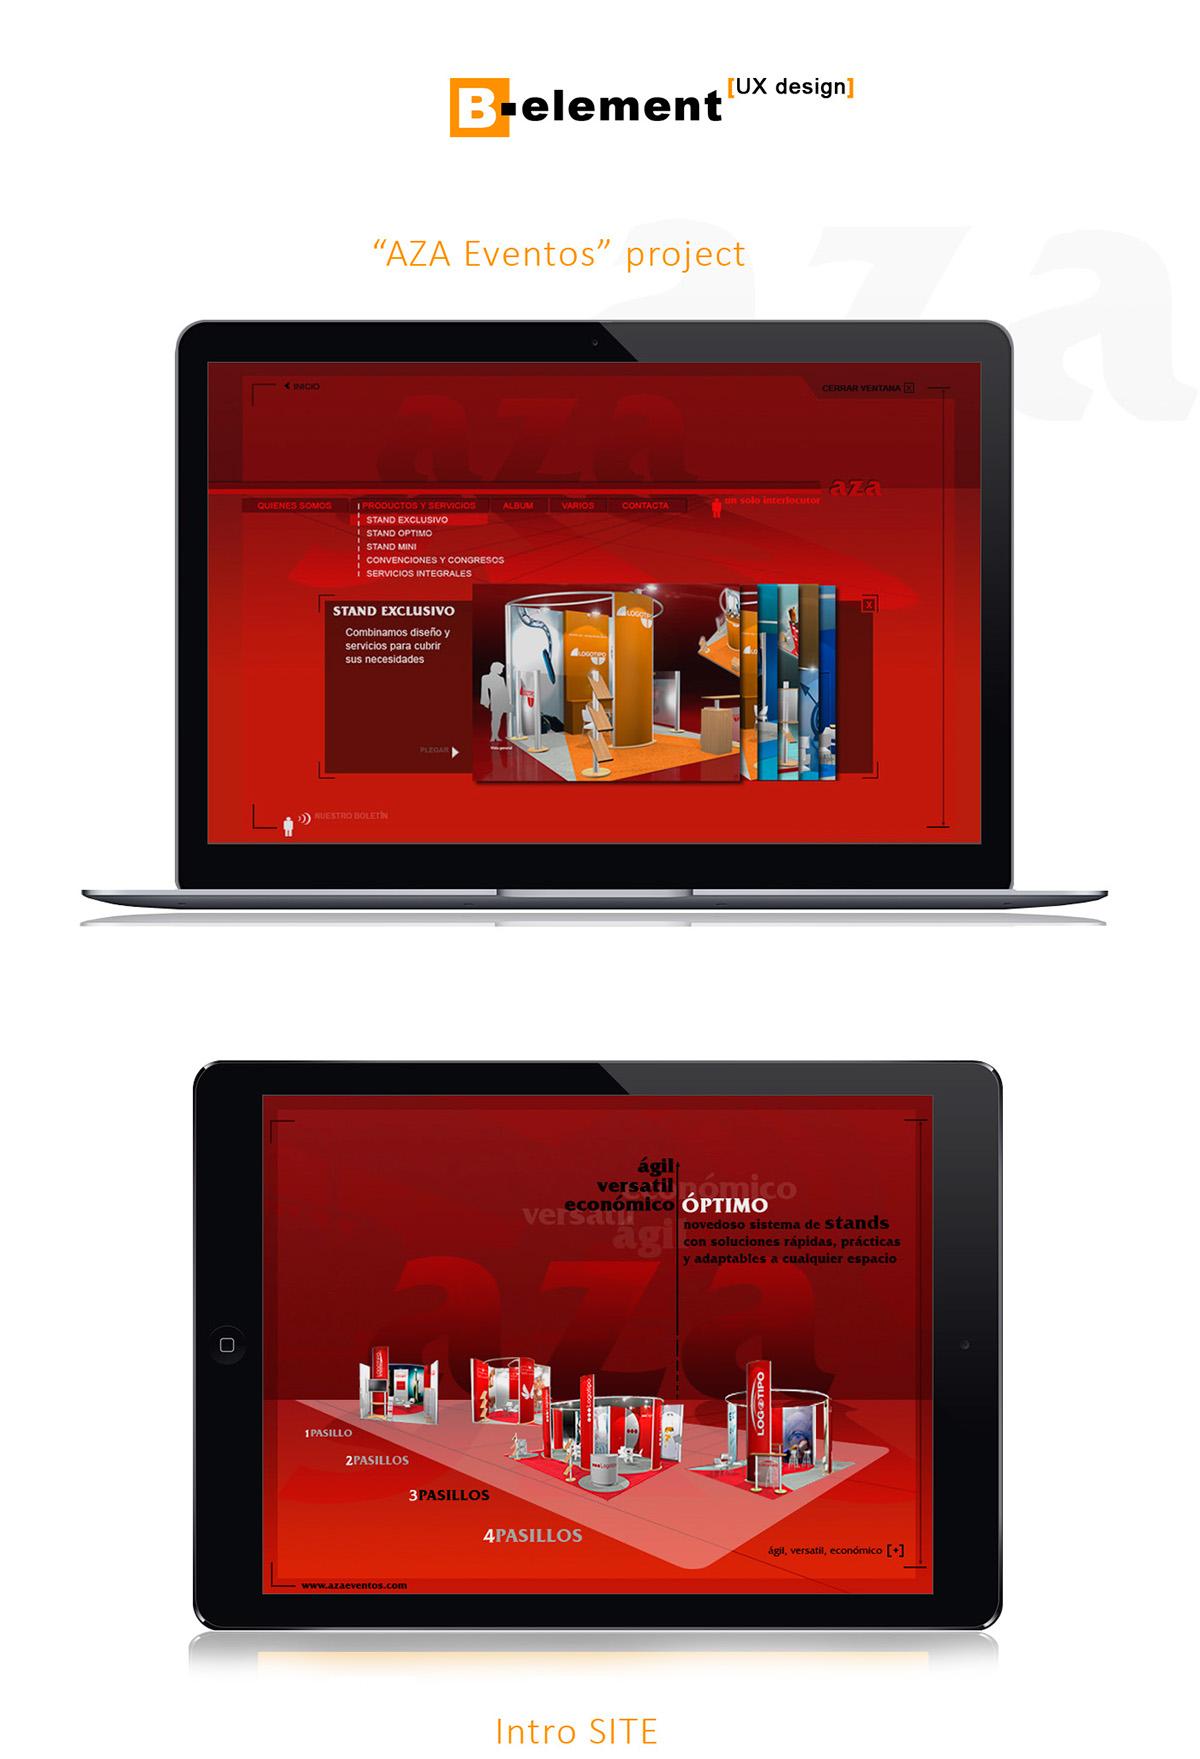 grafic design 3d design Usability Content Architecture ux Web Design